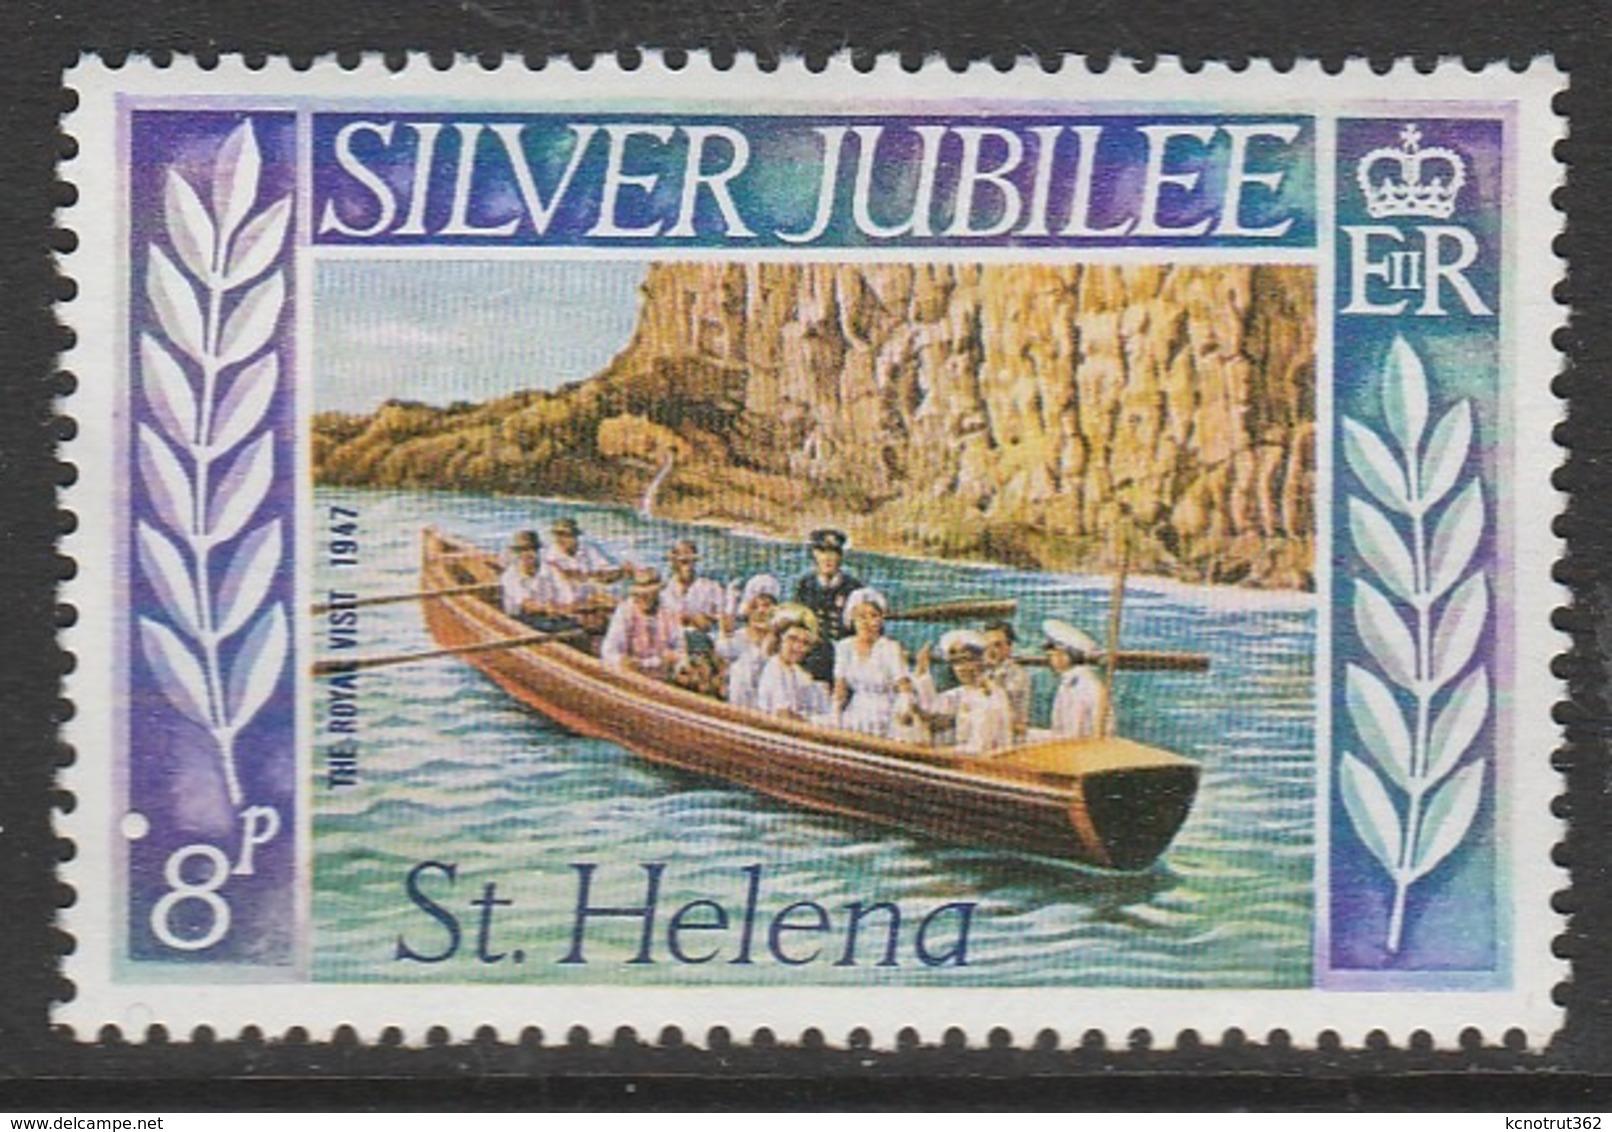 St Helena 1977 The 25th Anniversary Of Regency Of Queen Elizabeth II 8 P Multicoloured SW 306 ** MNH - Isola Di Sant'Elena